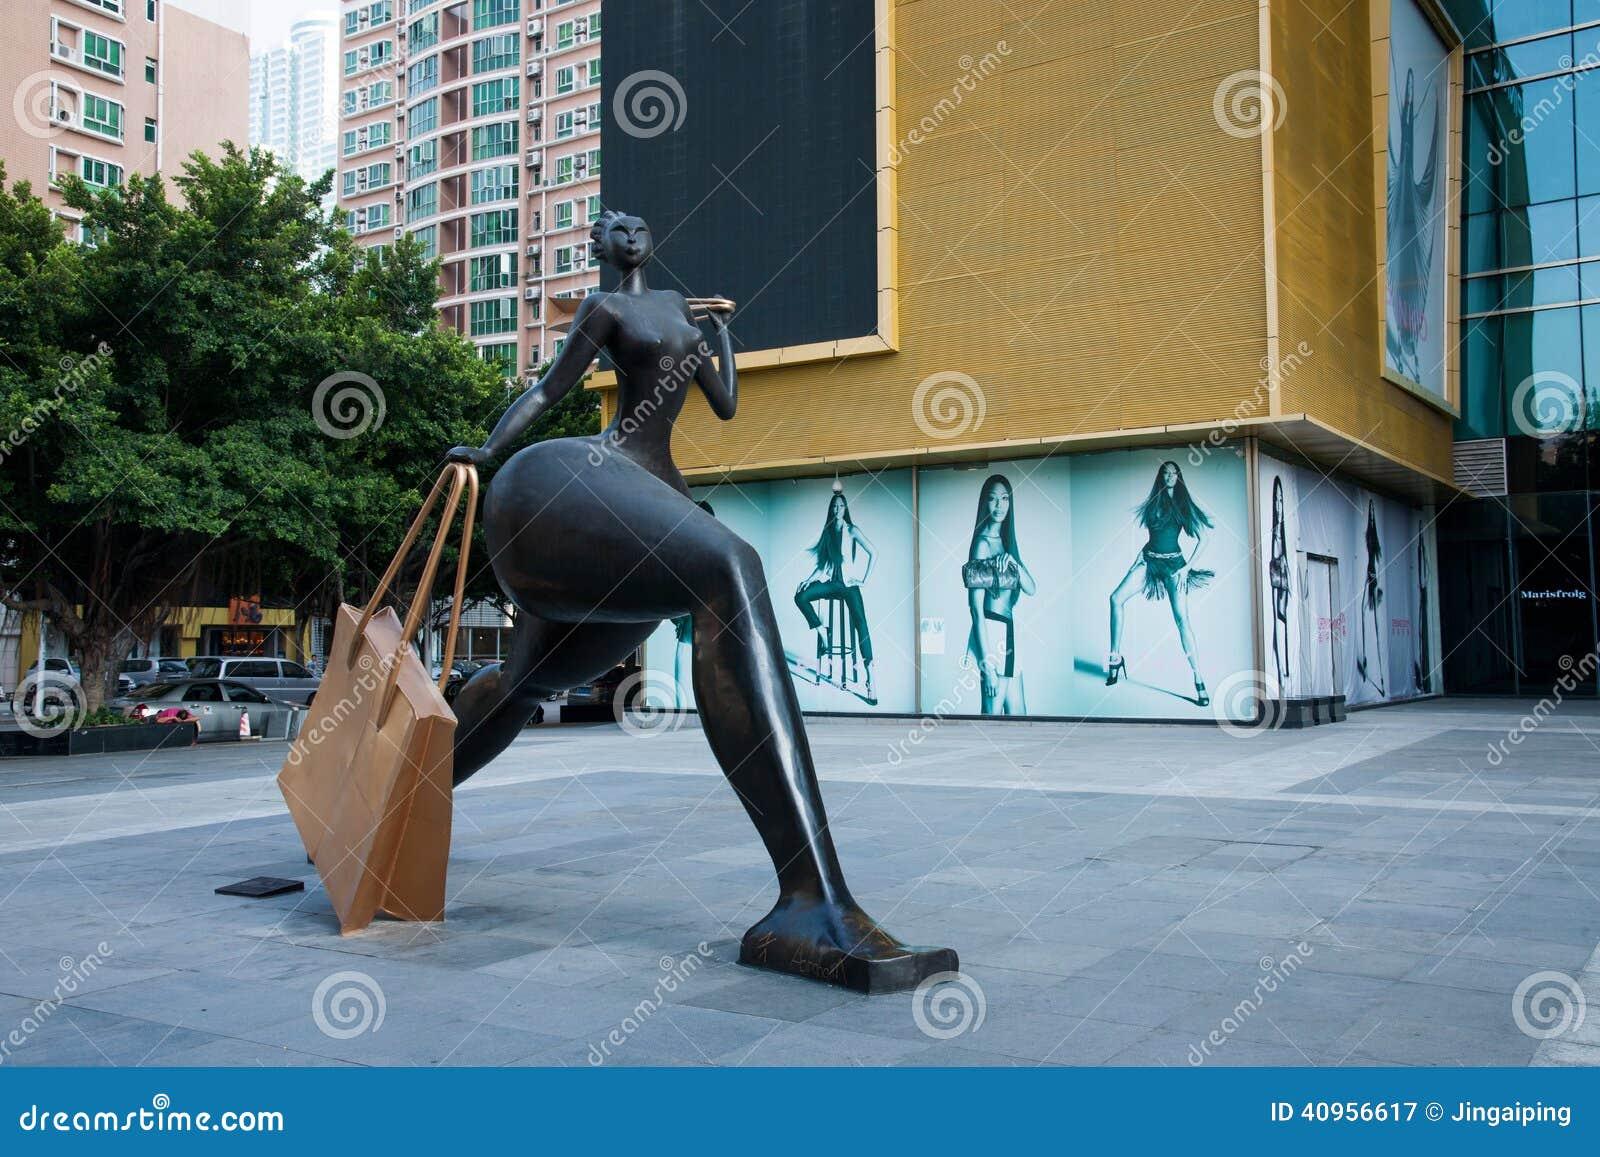 Shenzhen Hua Fu Road Street Town Plaza Shopping Sculpture